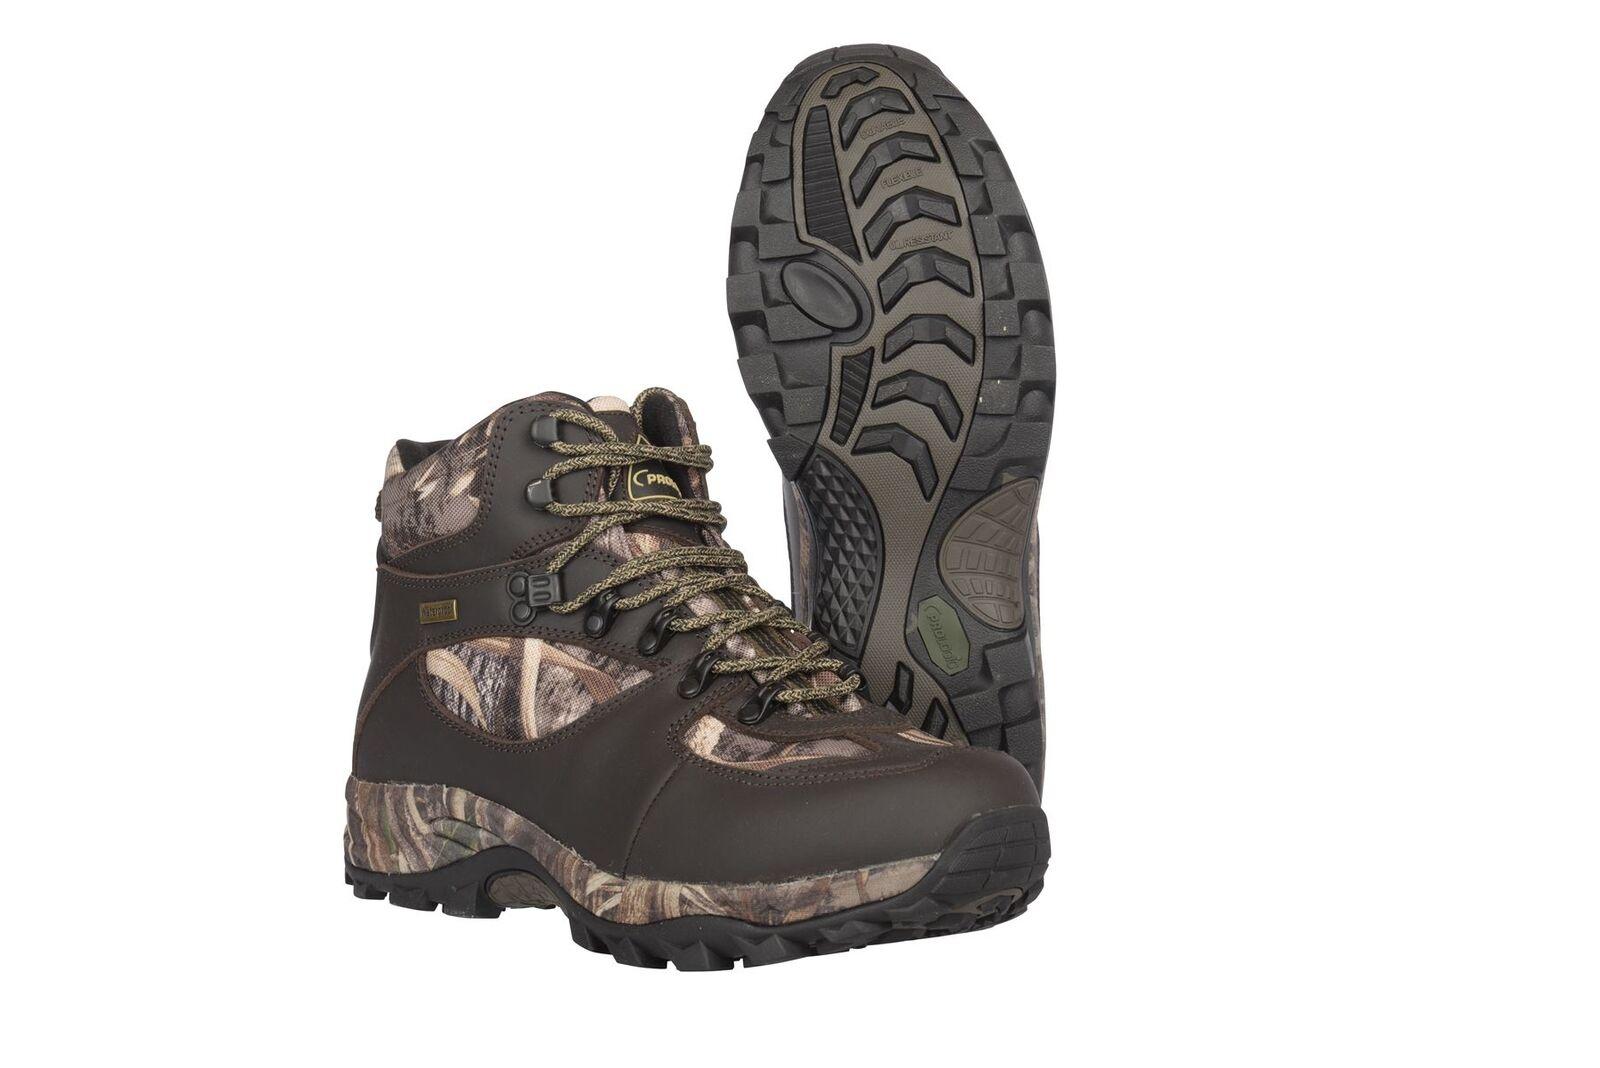 Prologic Max5 HP Polar Zone Boots Camo Waterproof Carp Hunting Fishing